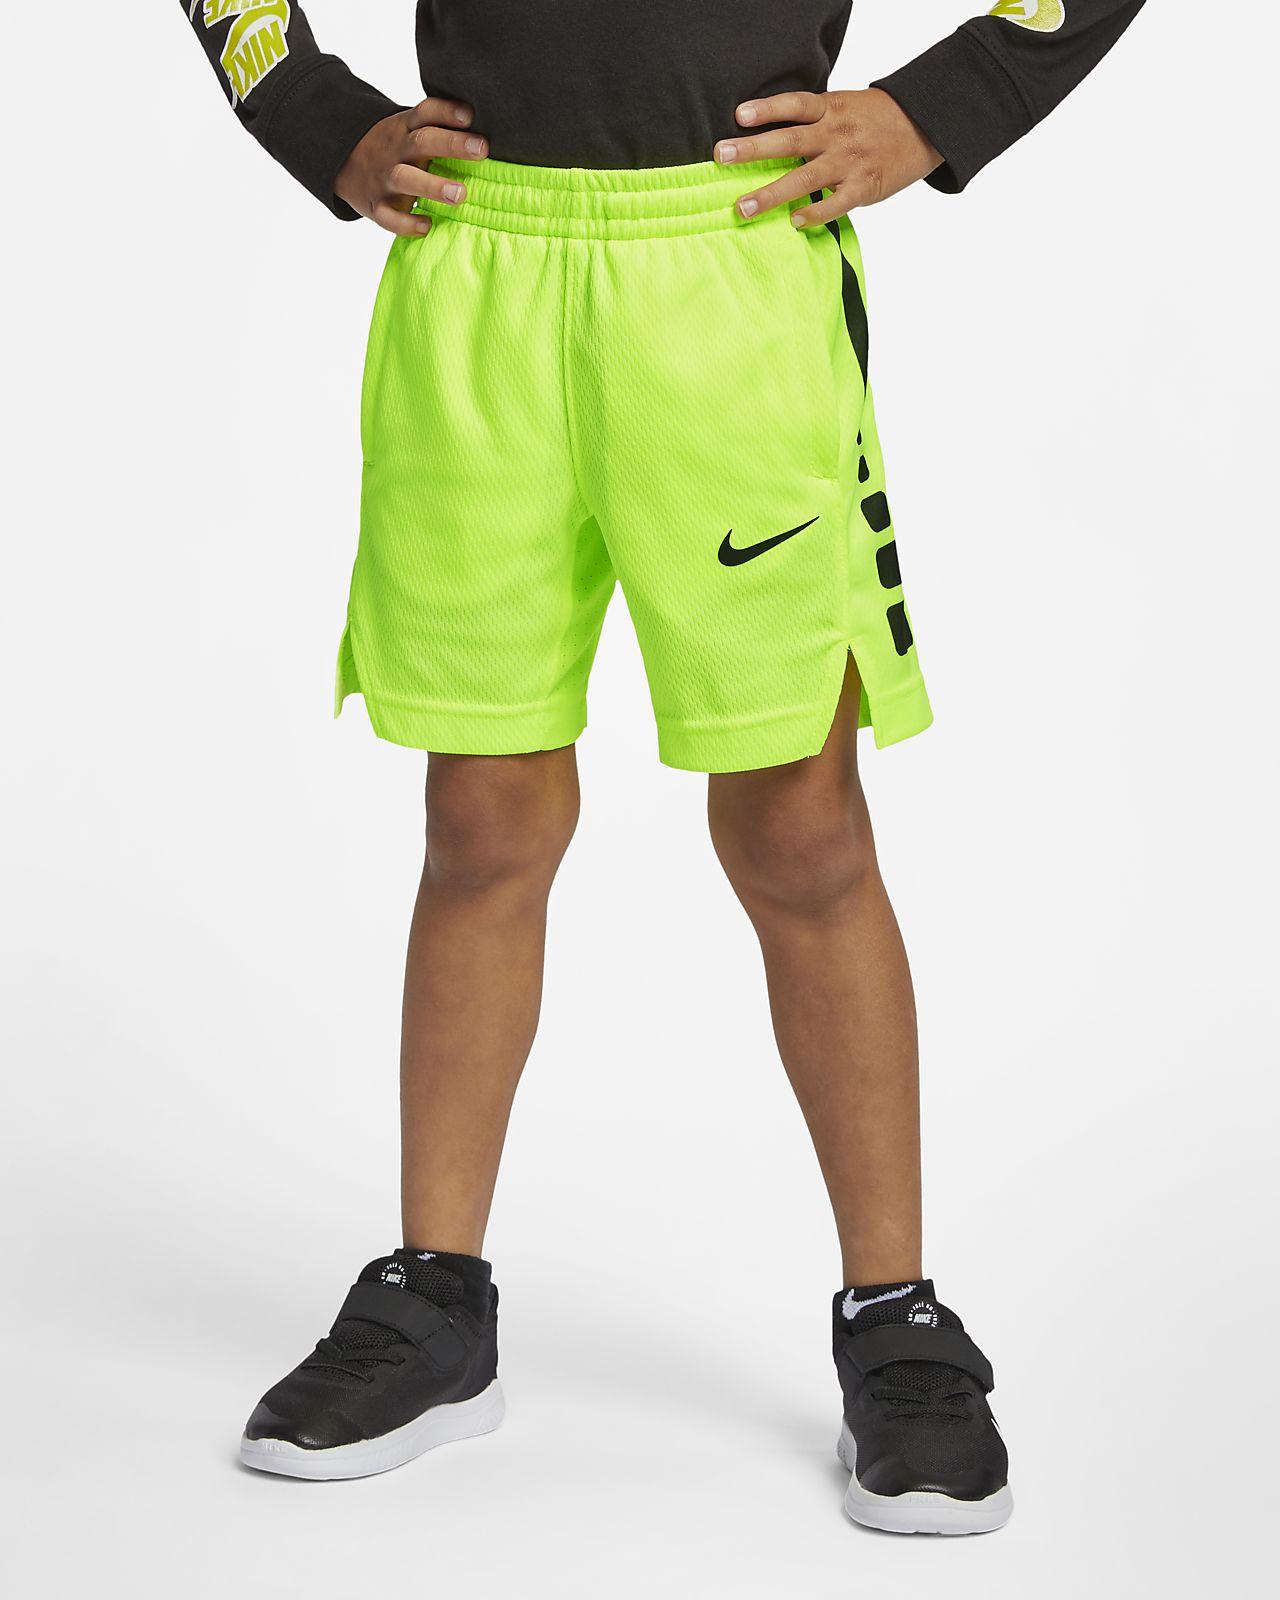 99872210c675 Nike Elite Infant Toddler Striped Shorts. Nike.com